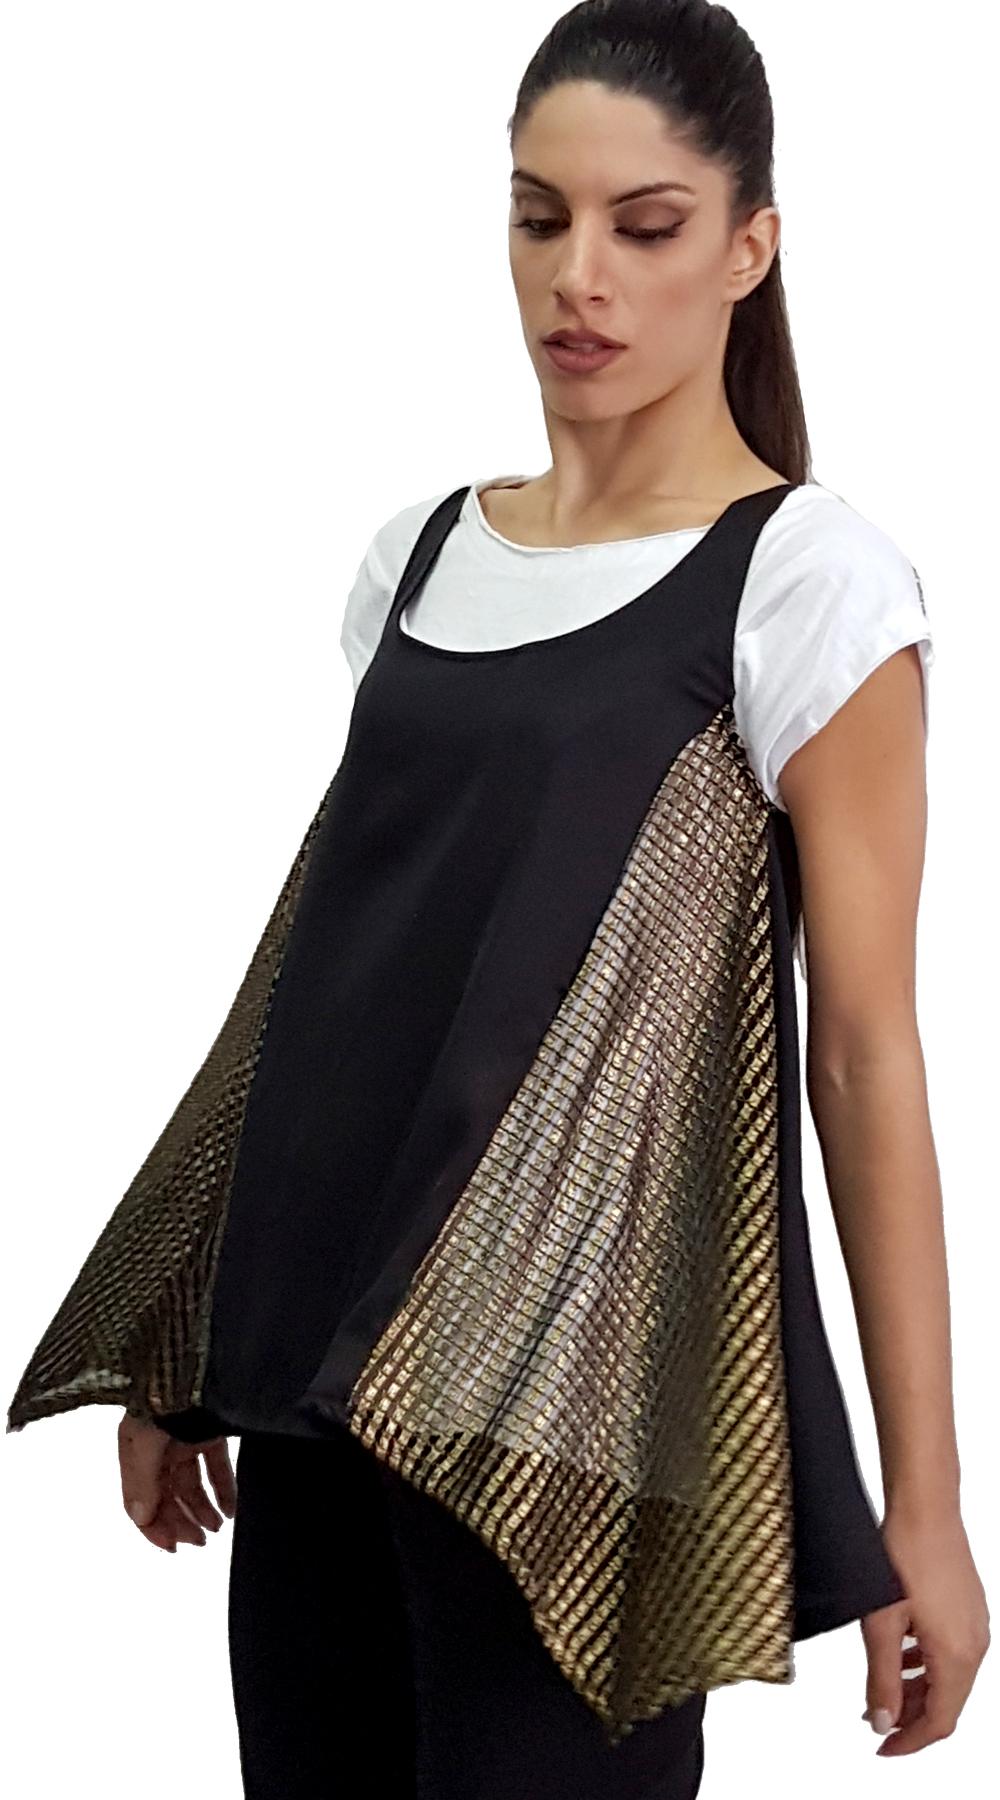 07e6c71a2808 online αγορές ενδυματα μπλούζες τοπς t shirts crop tops all elegant ...